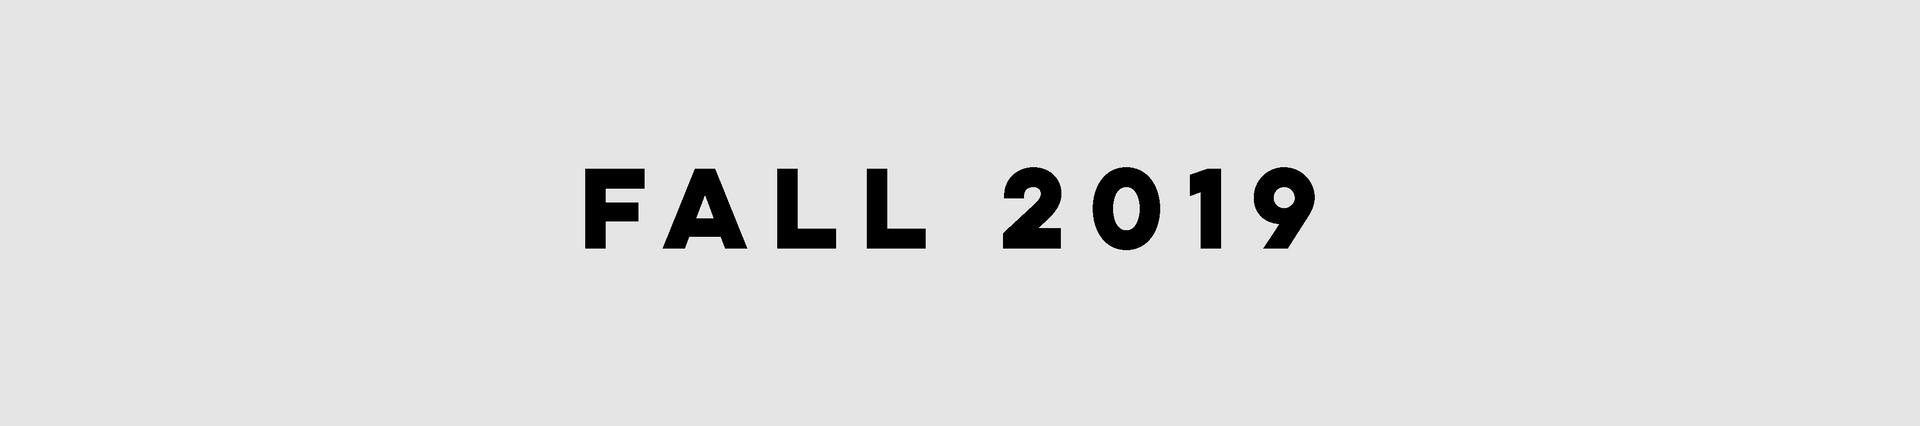 OGI Fall 2019